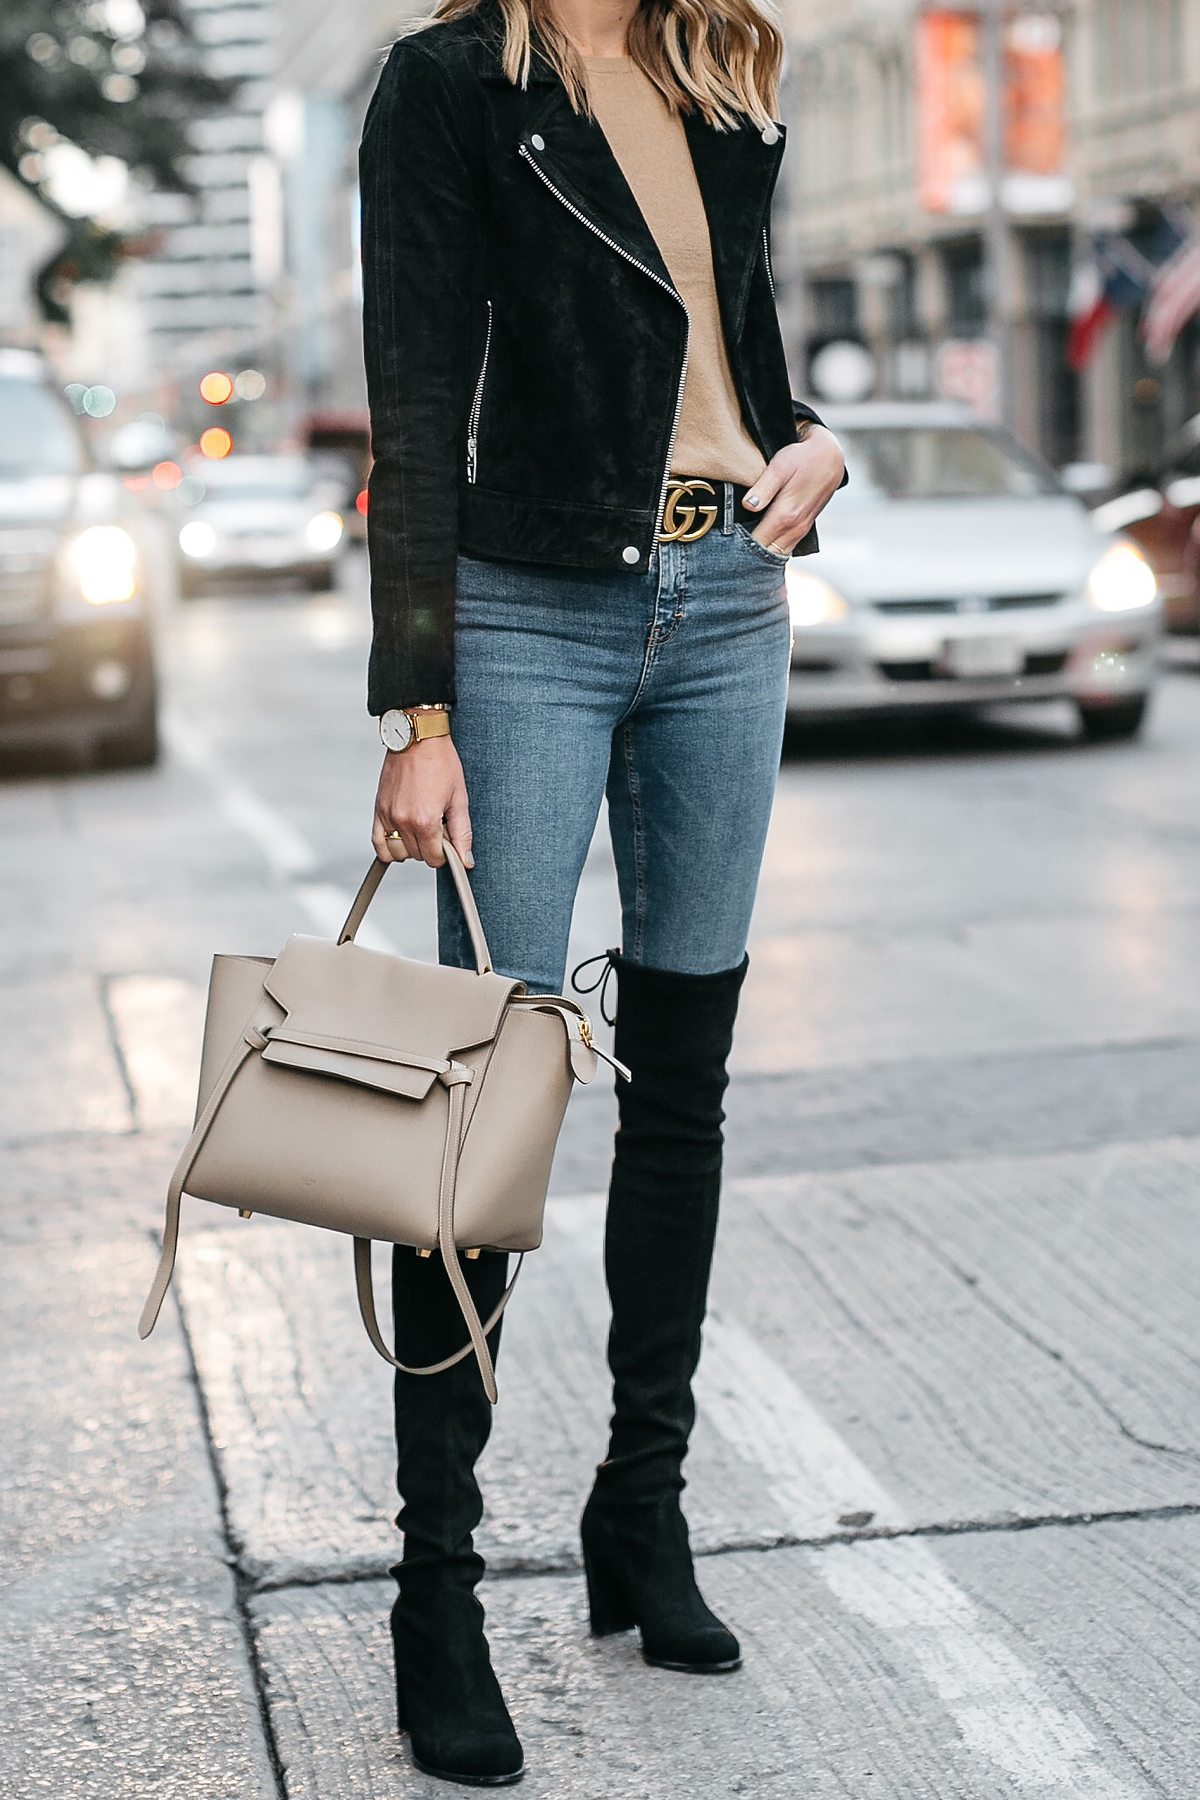 65c67e0755b Black Suede Moto Jacket Camel Sweater Denim Skinny Jeans Stuart Weitzman  Over-the-Knee